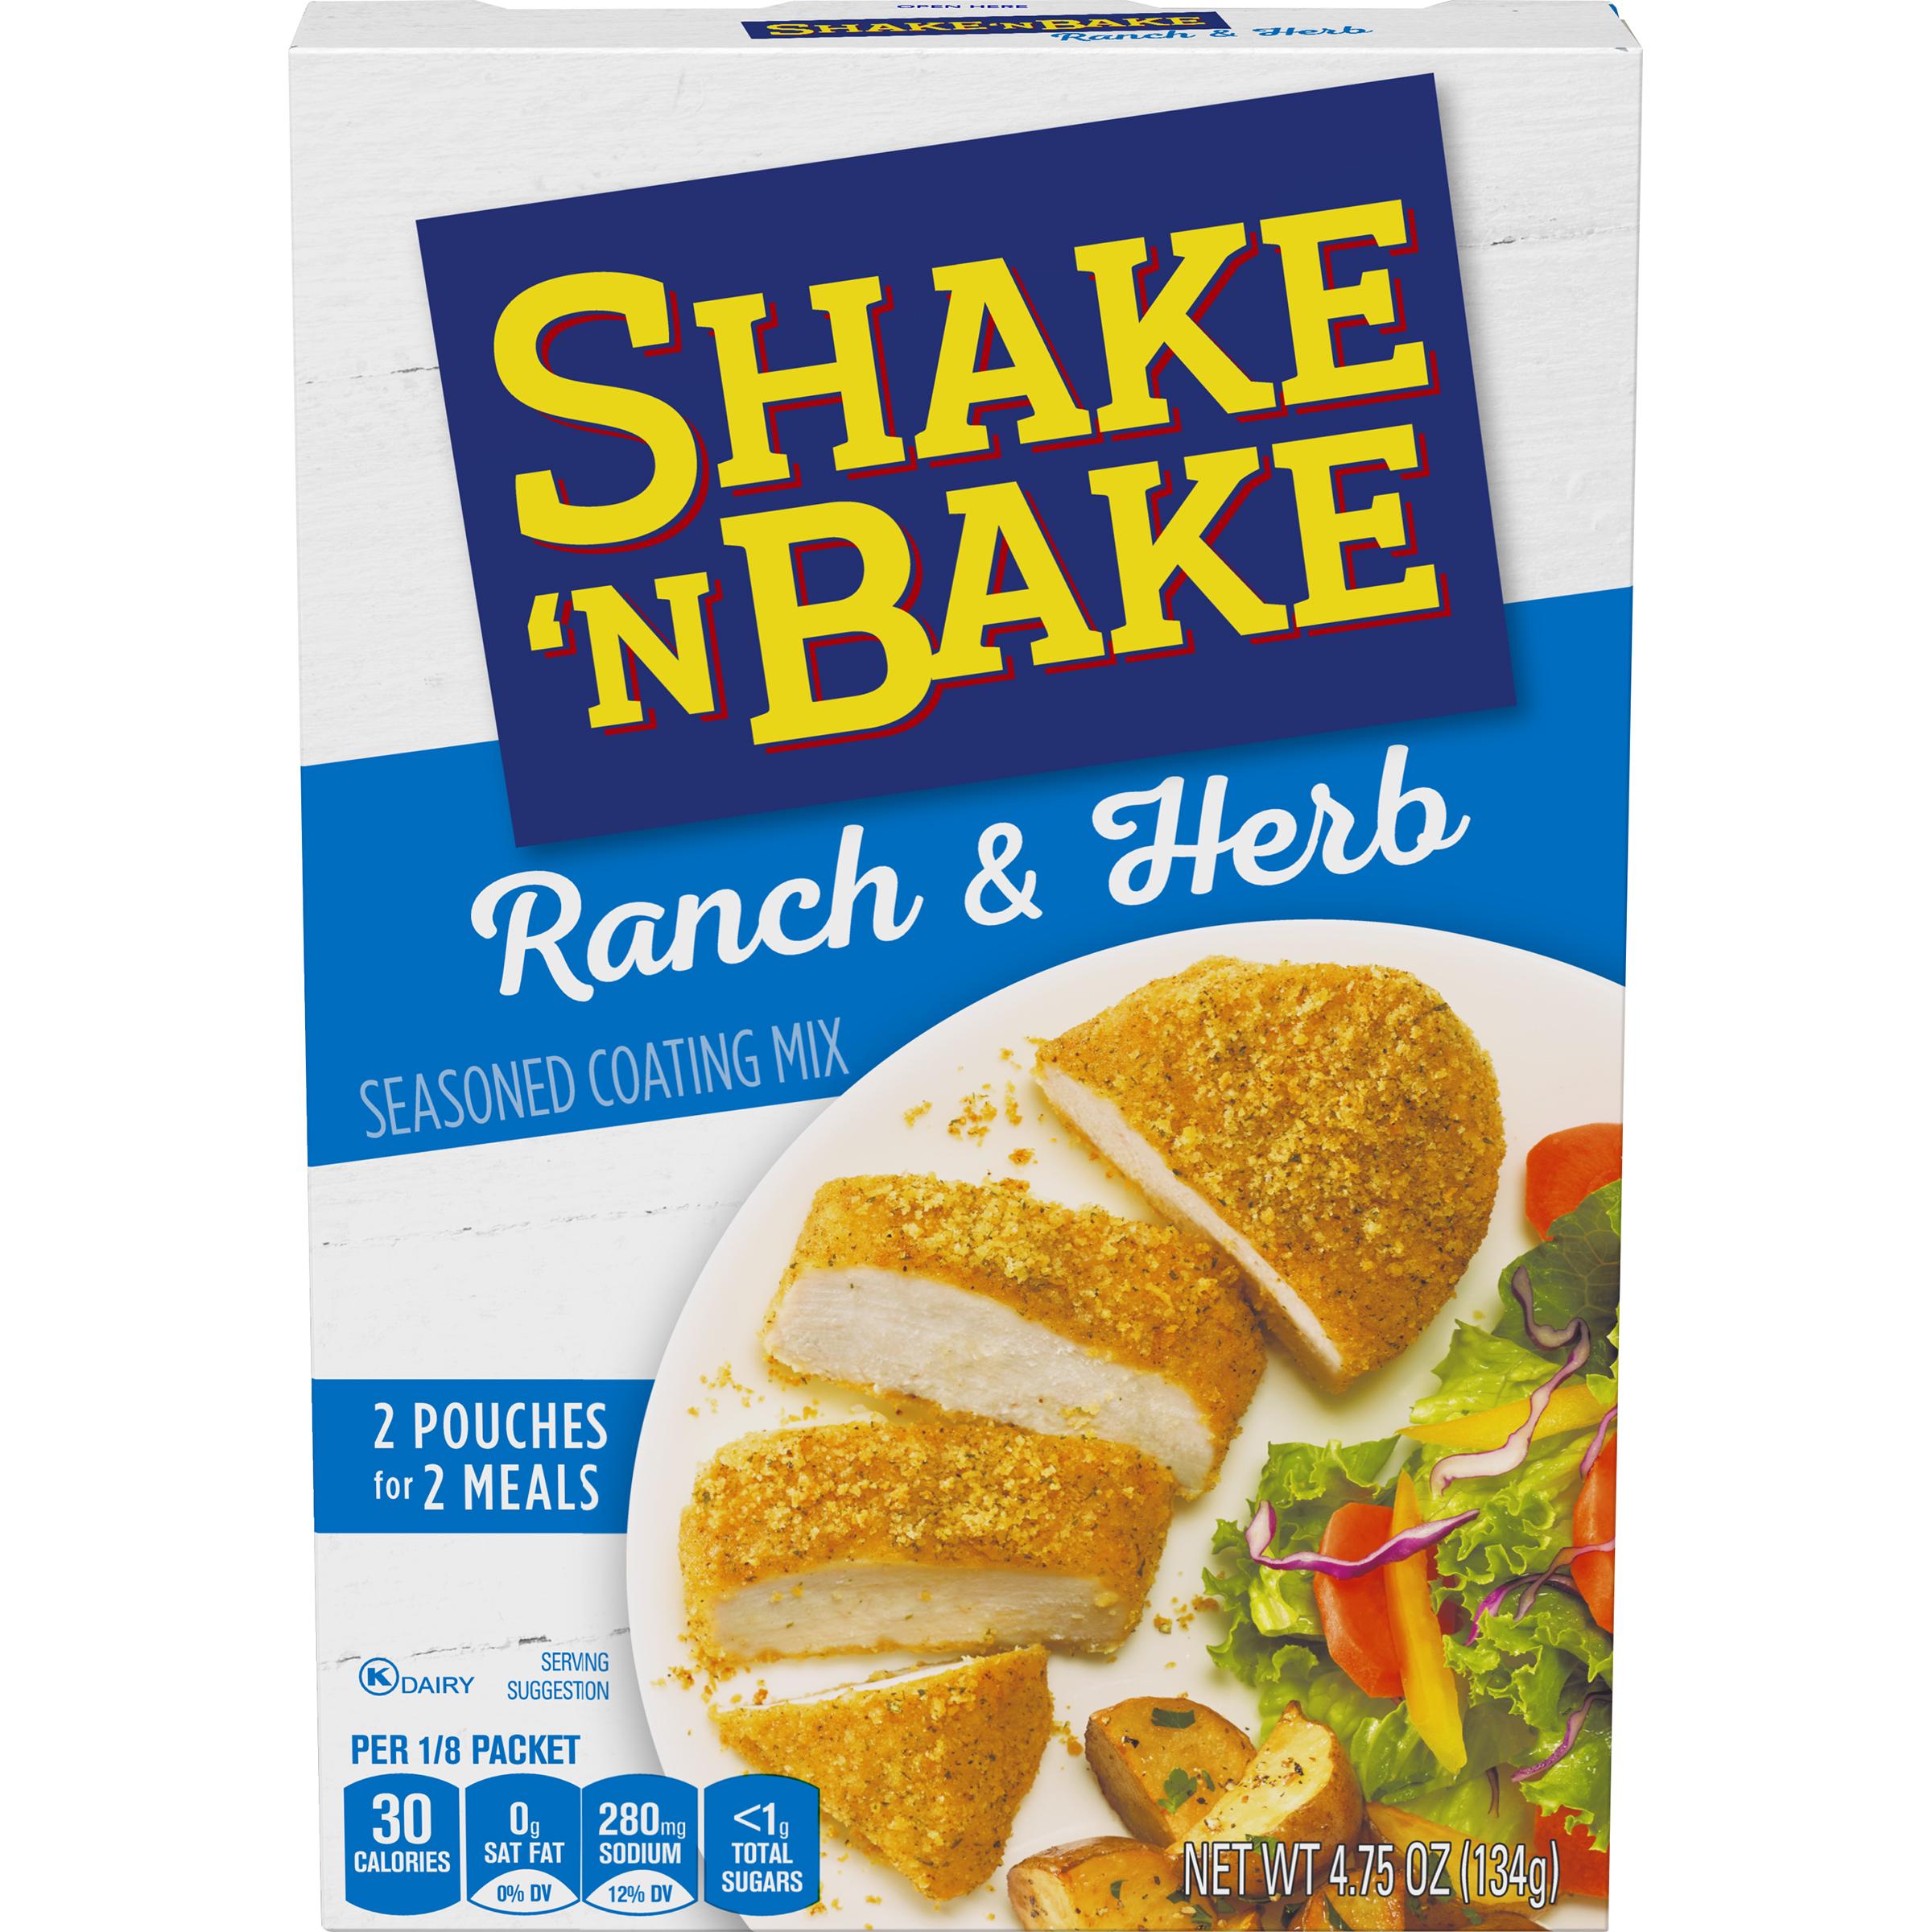 Shake 'N Bake Ranch & Herb Seasoned Coating Mix